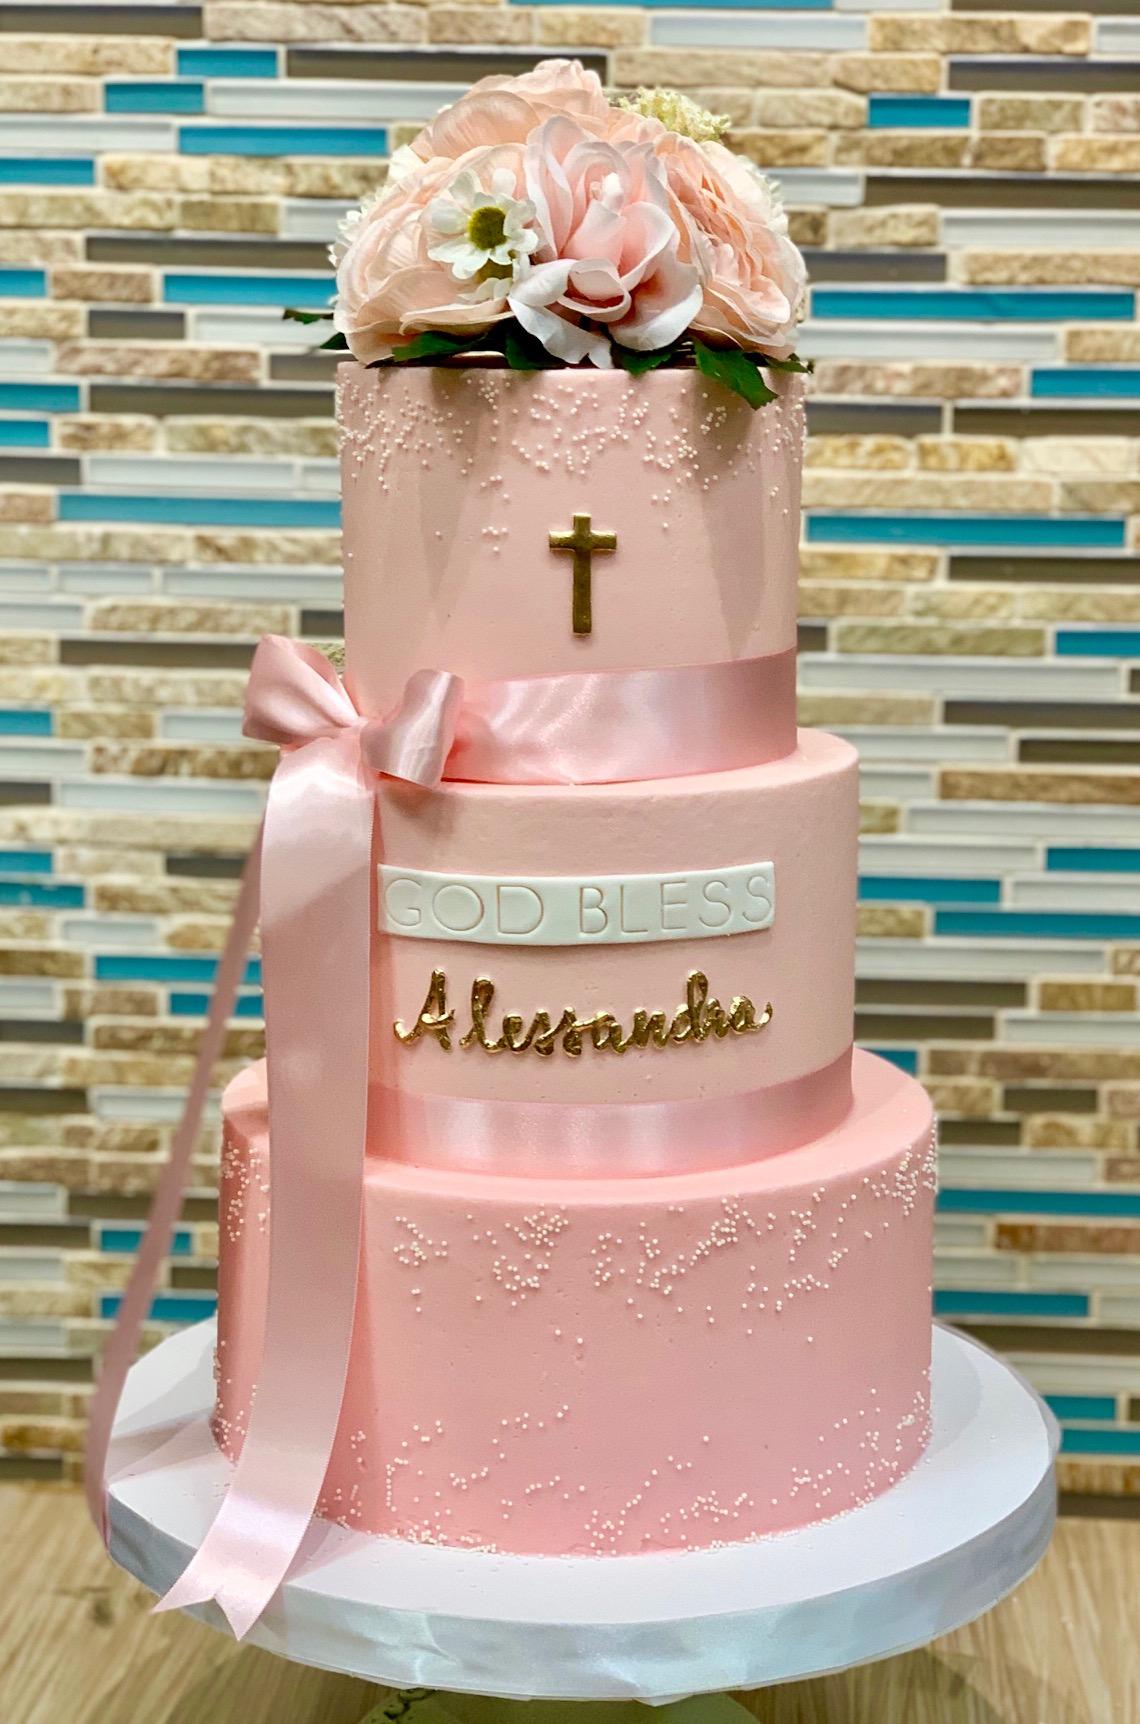 3 Tier Baptism Cake